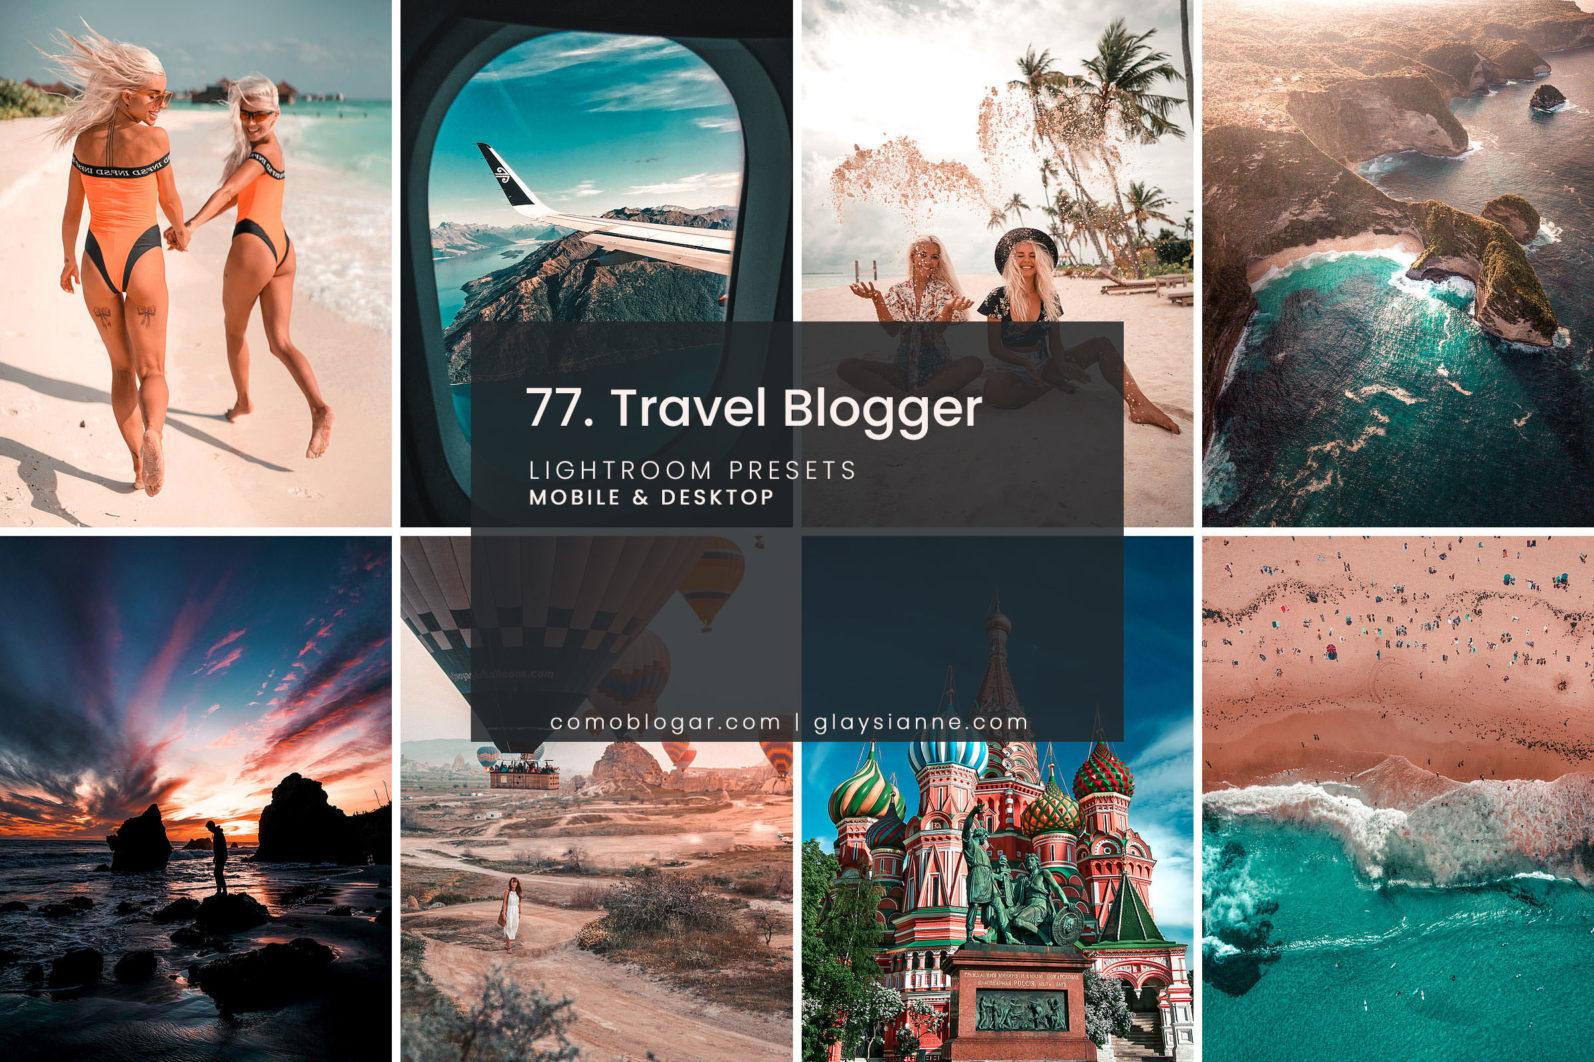 77. Travel Blogger Presets - 77.Travel Blogger 01 1 -